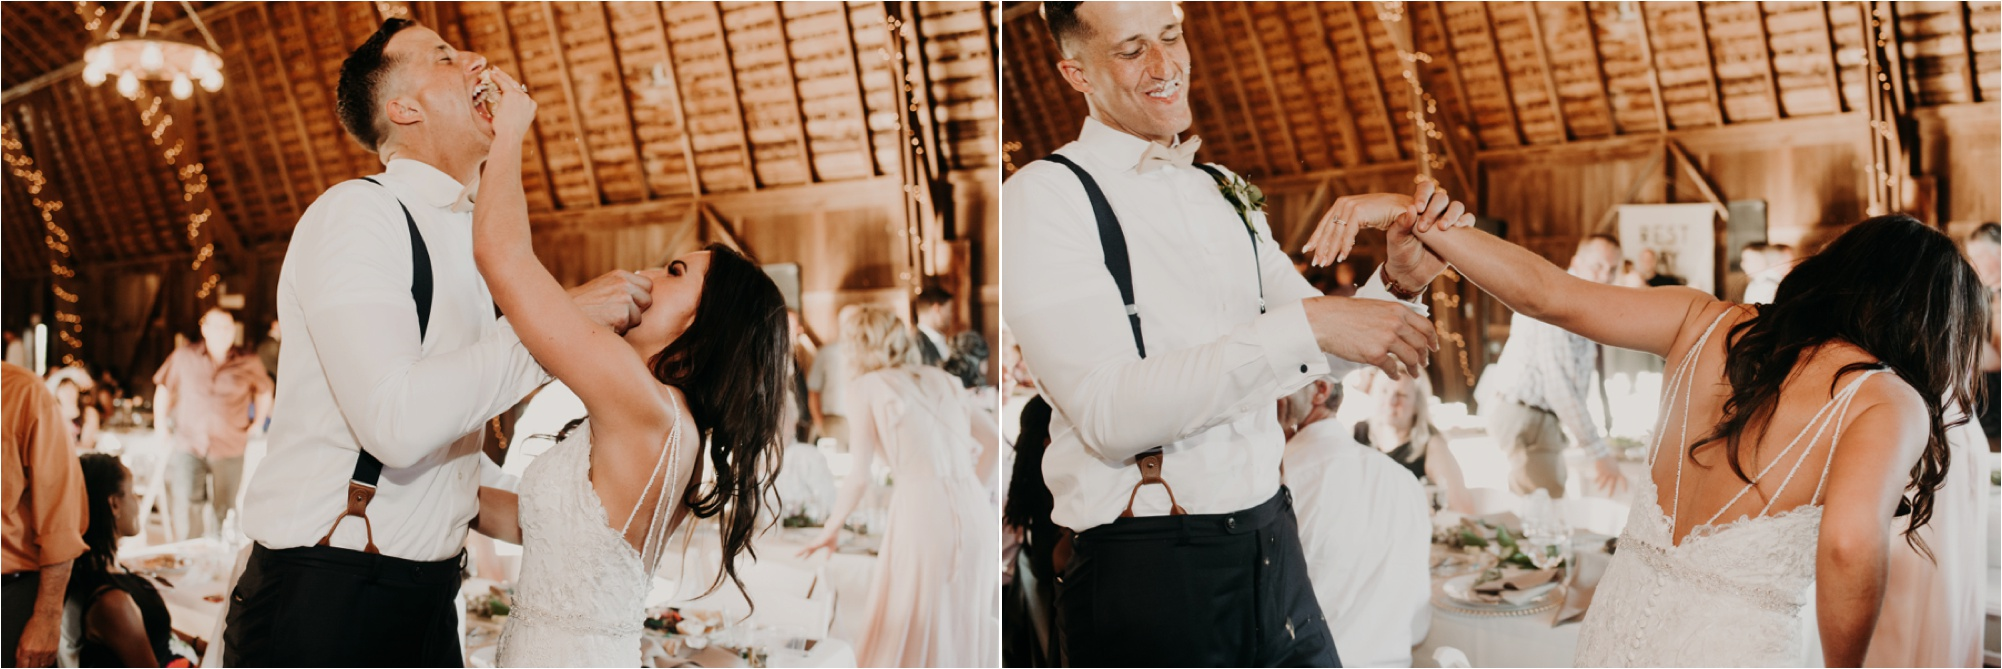 The Barn and Black Ridge Wedding Minneapolis Wedding Photographer_4167.jpg